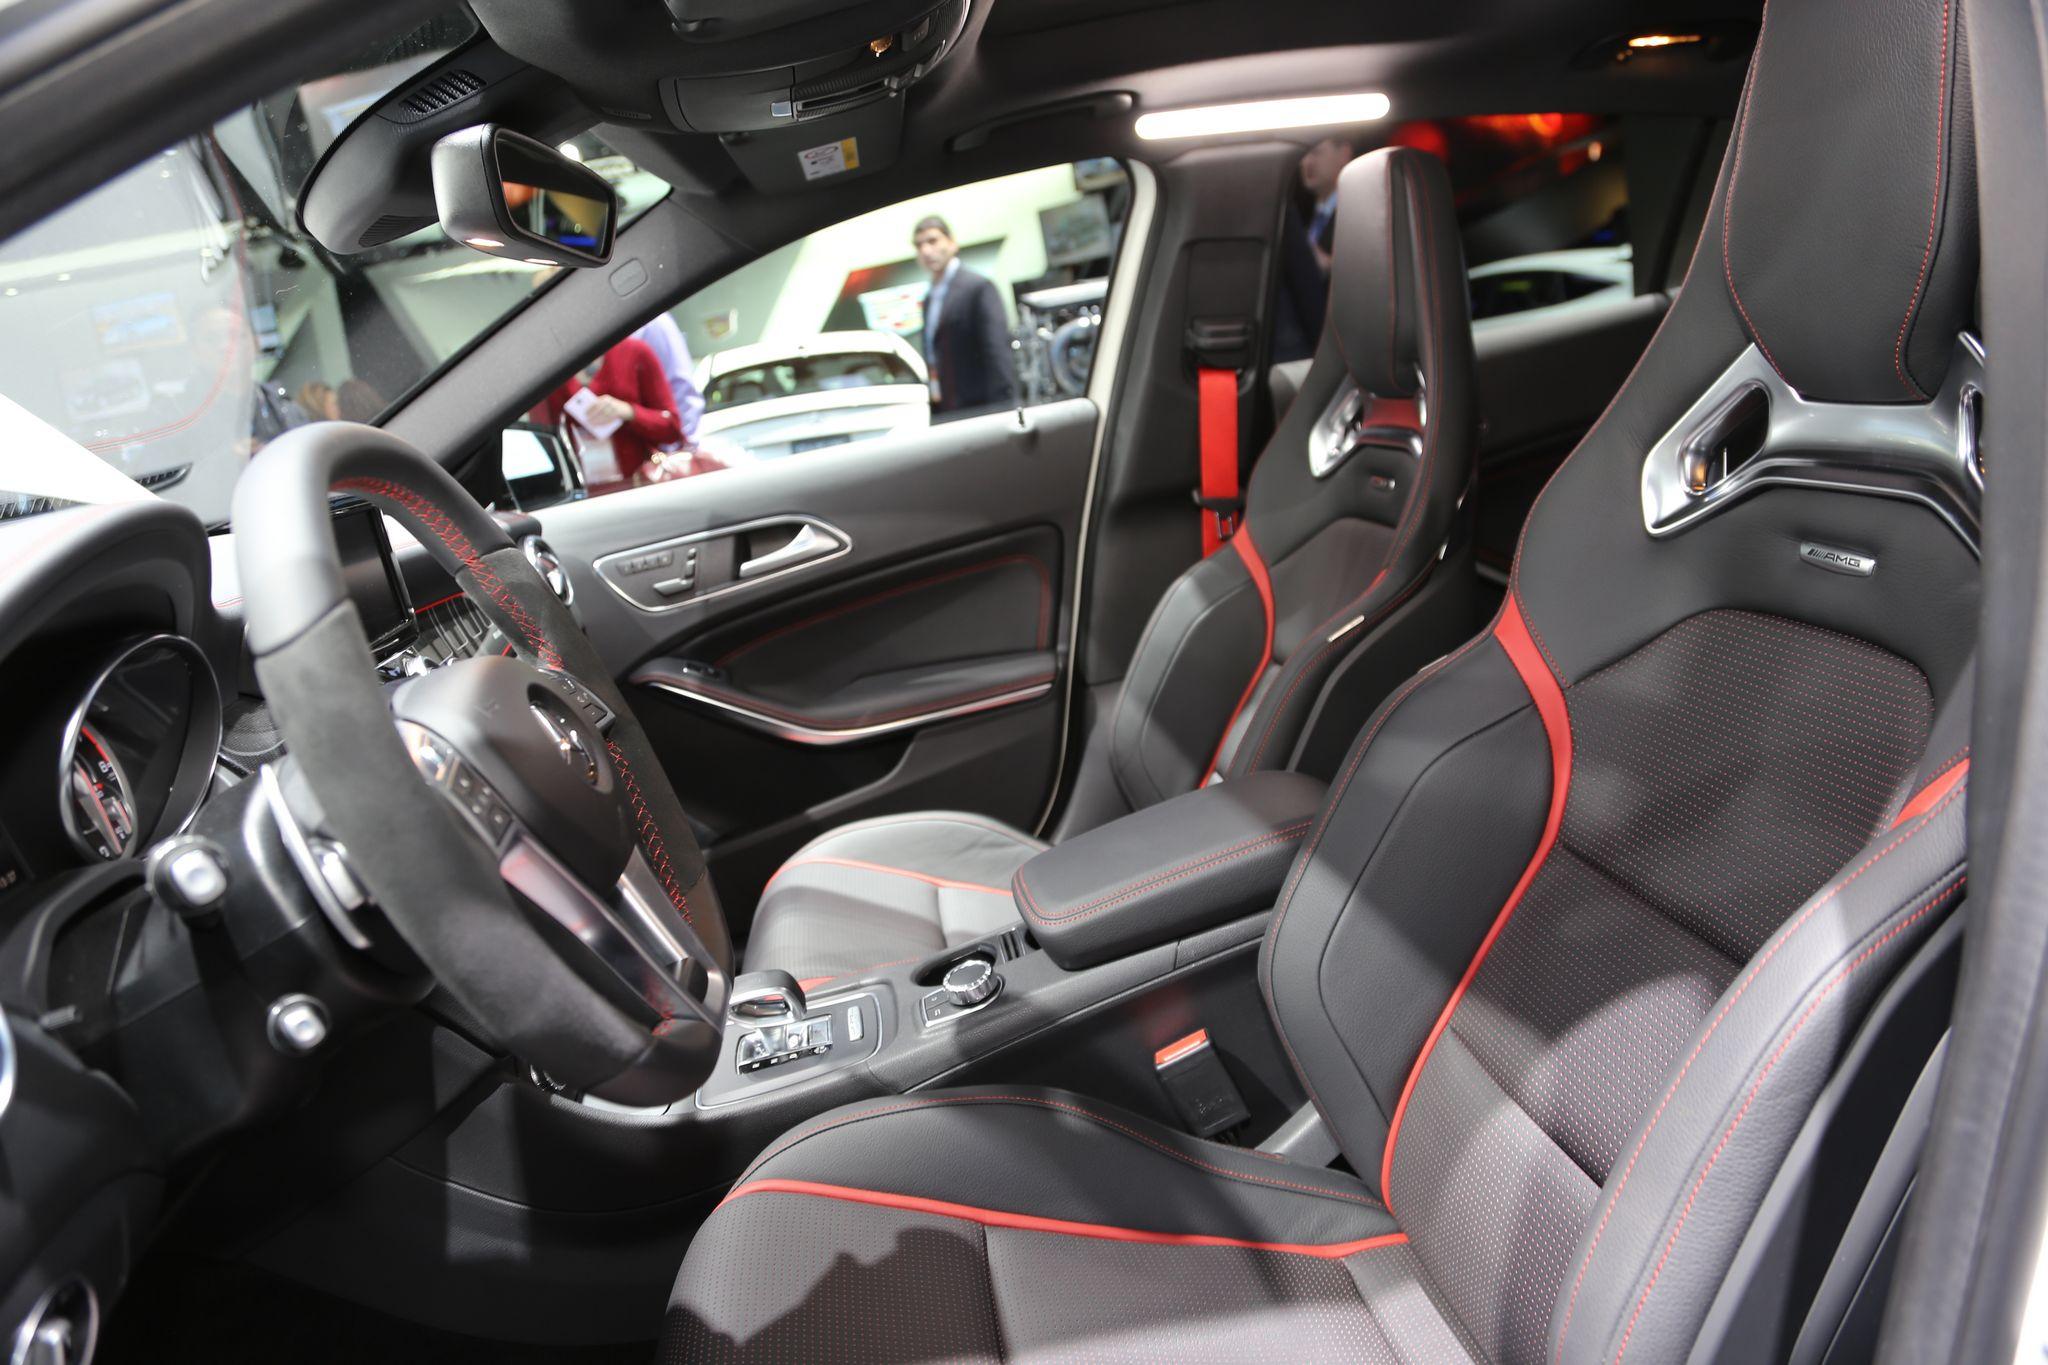 Gla 45 amg 4matic interior a mercedes for Mercedes benz gla class interior